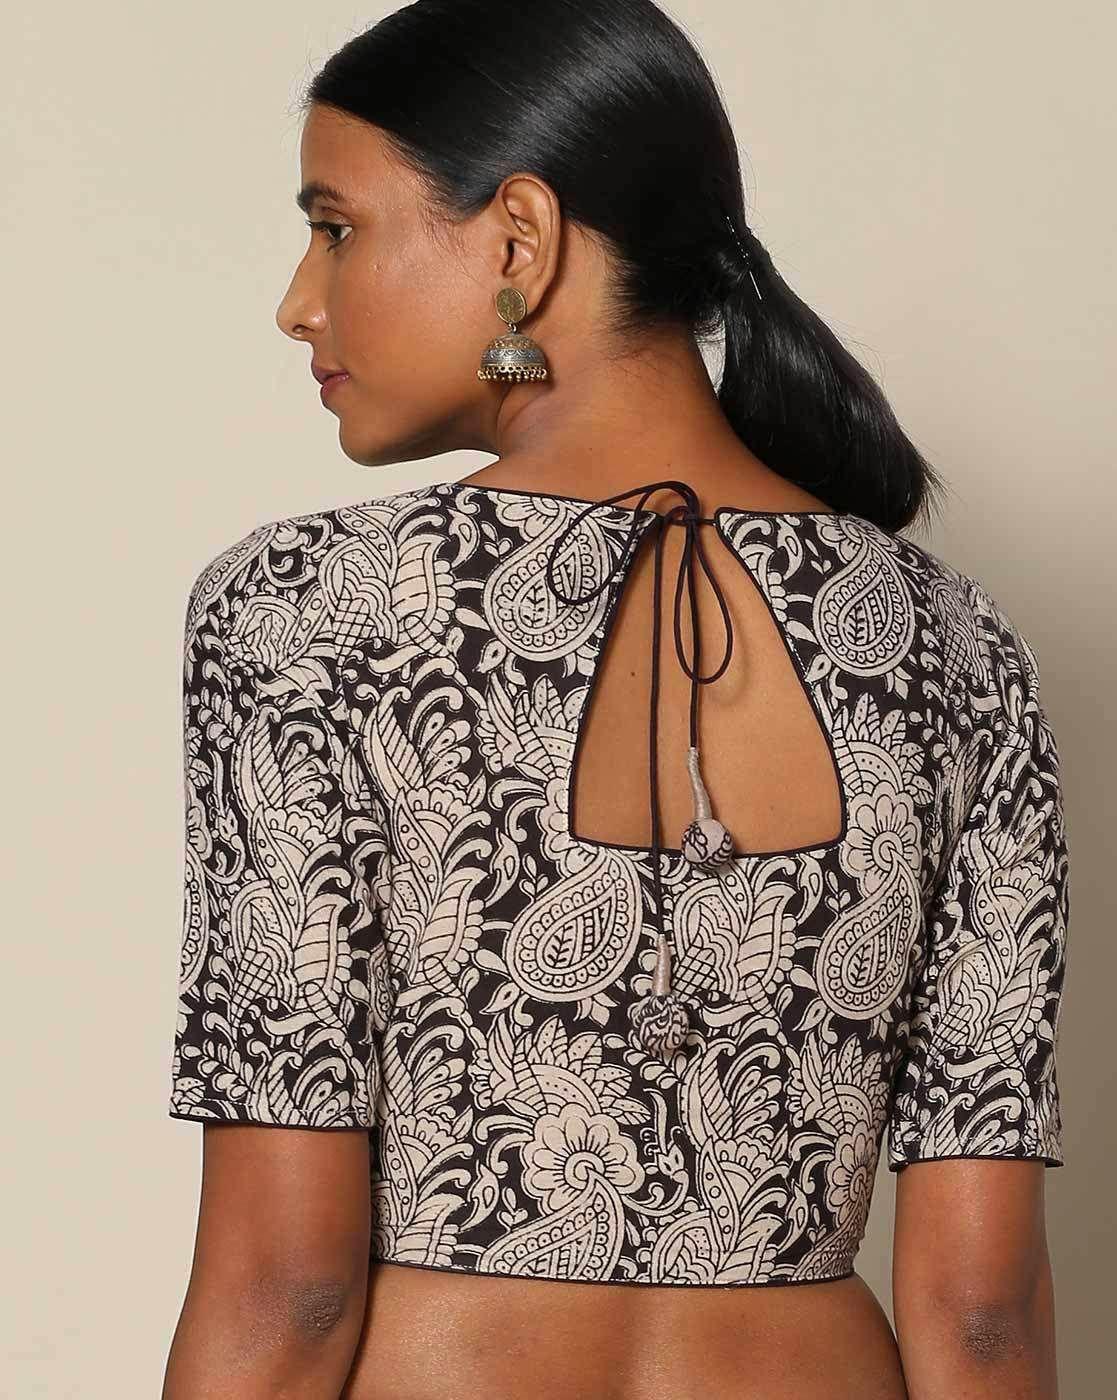 Saree blouse design for cotton saree  simple blouse back neck designs for cotton sarees  shweta